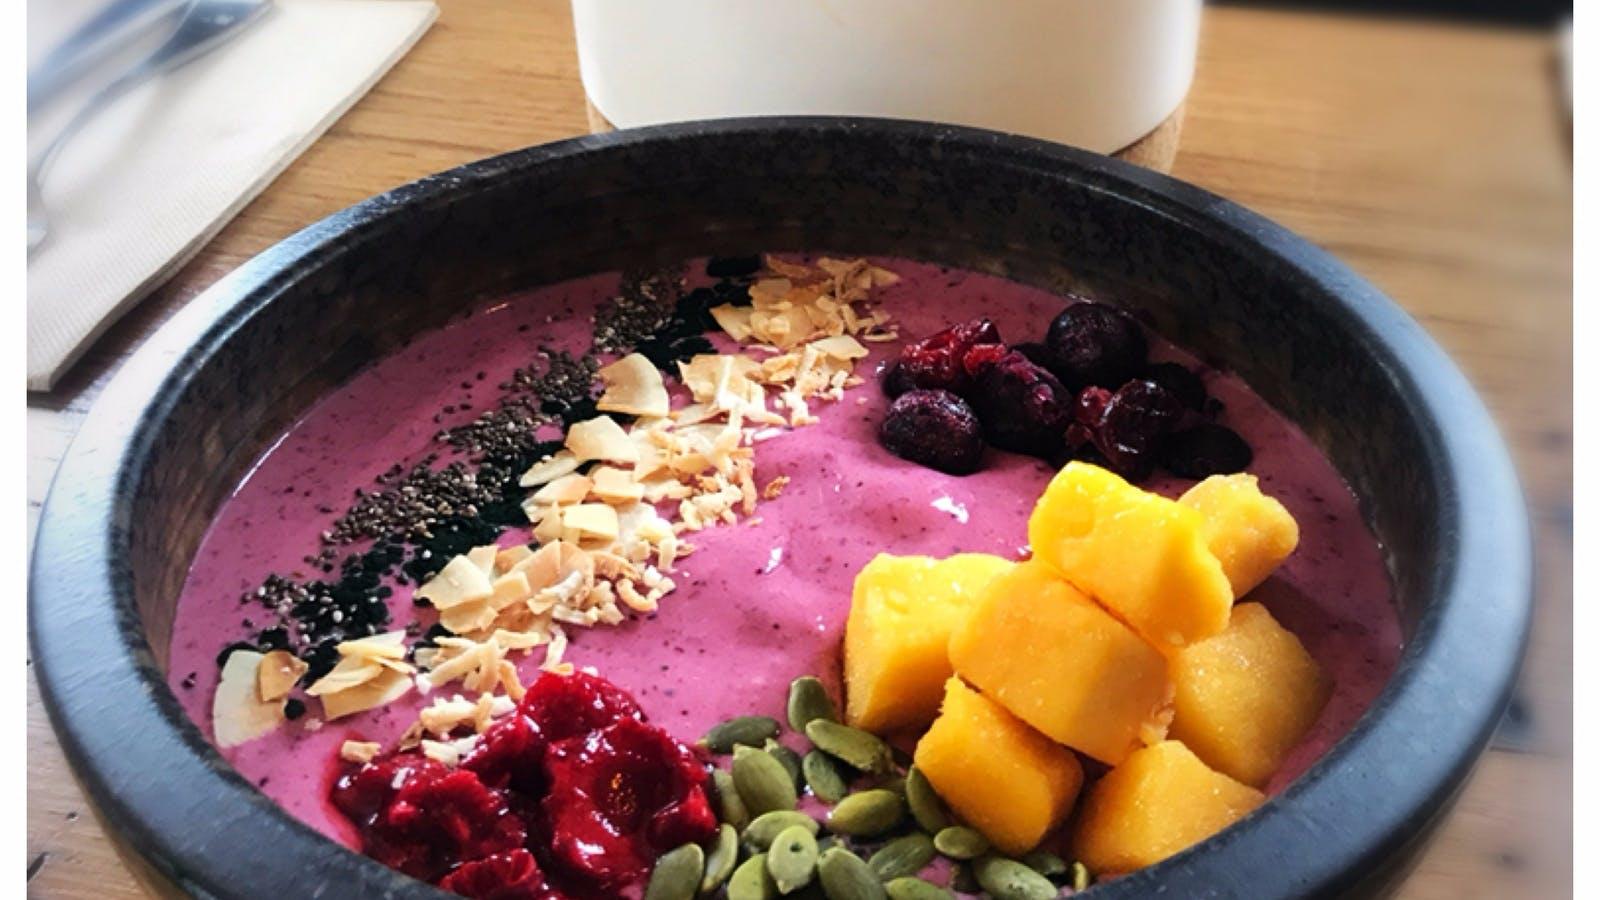 Banana berry smoothie bowl